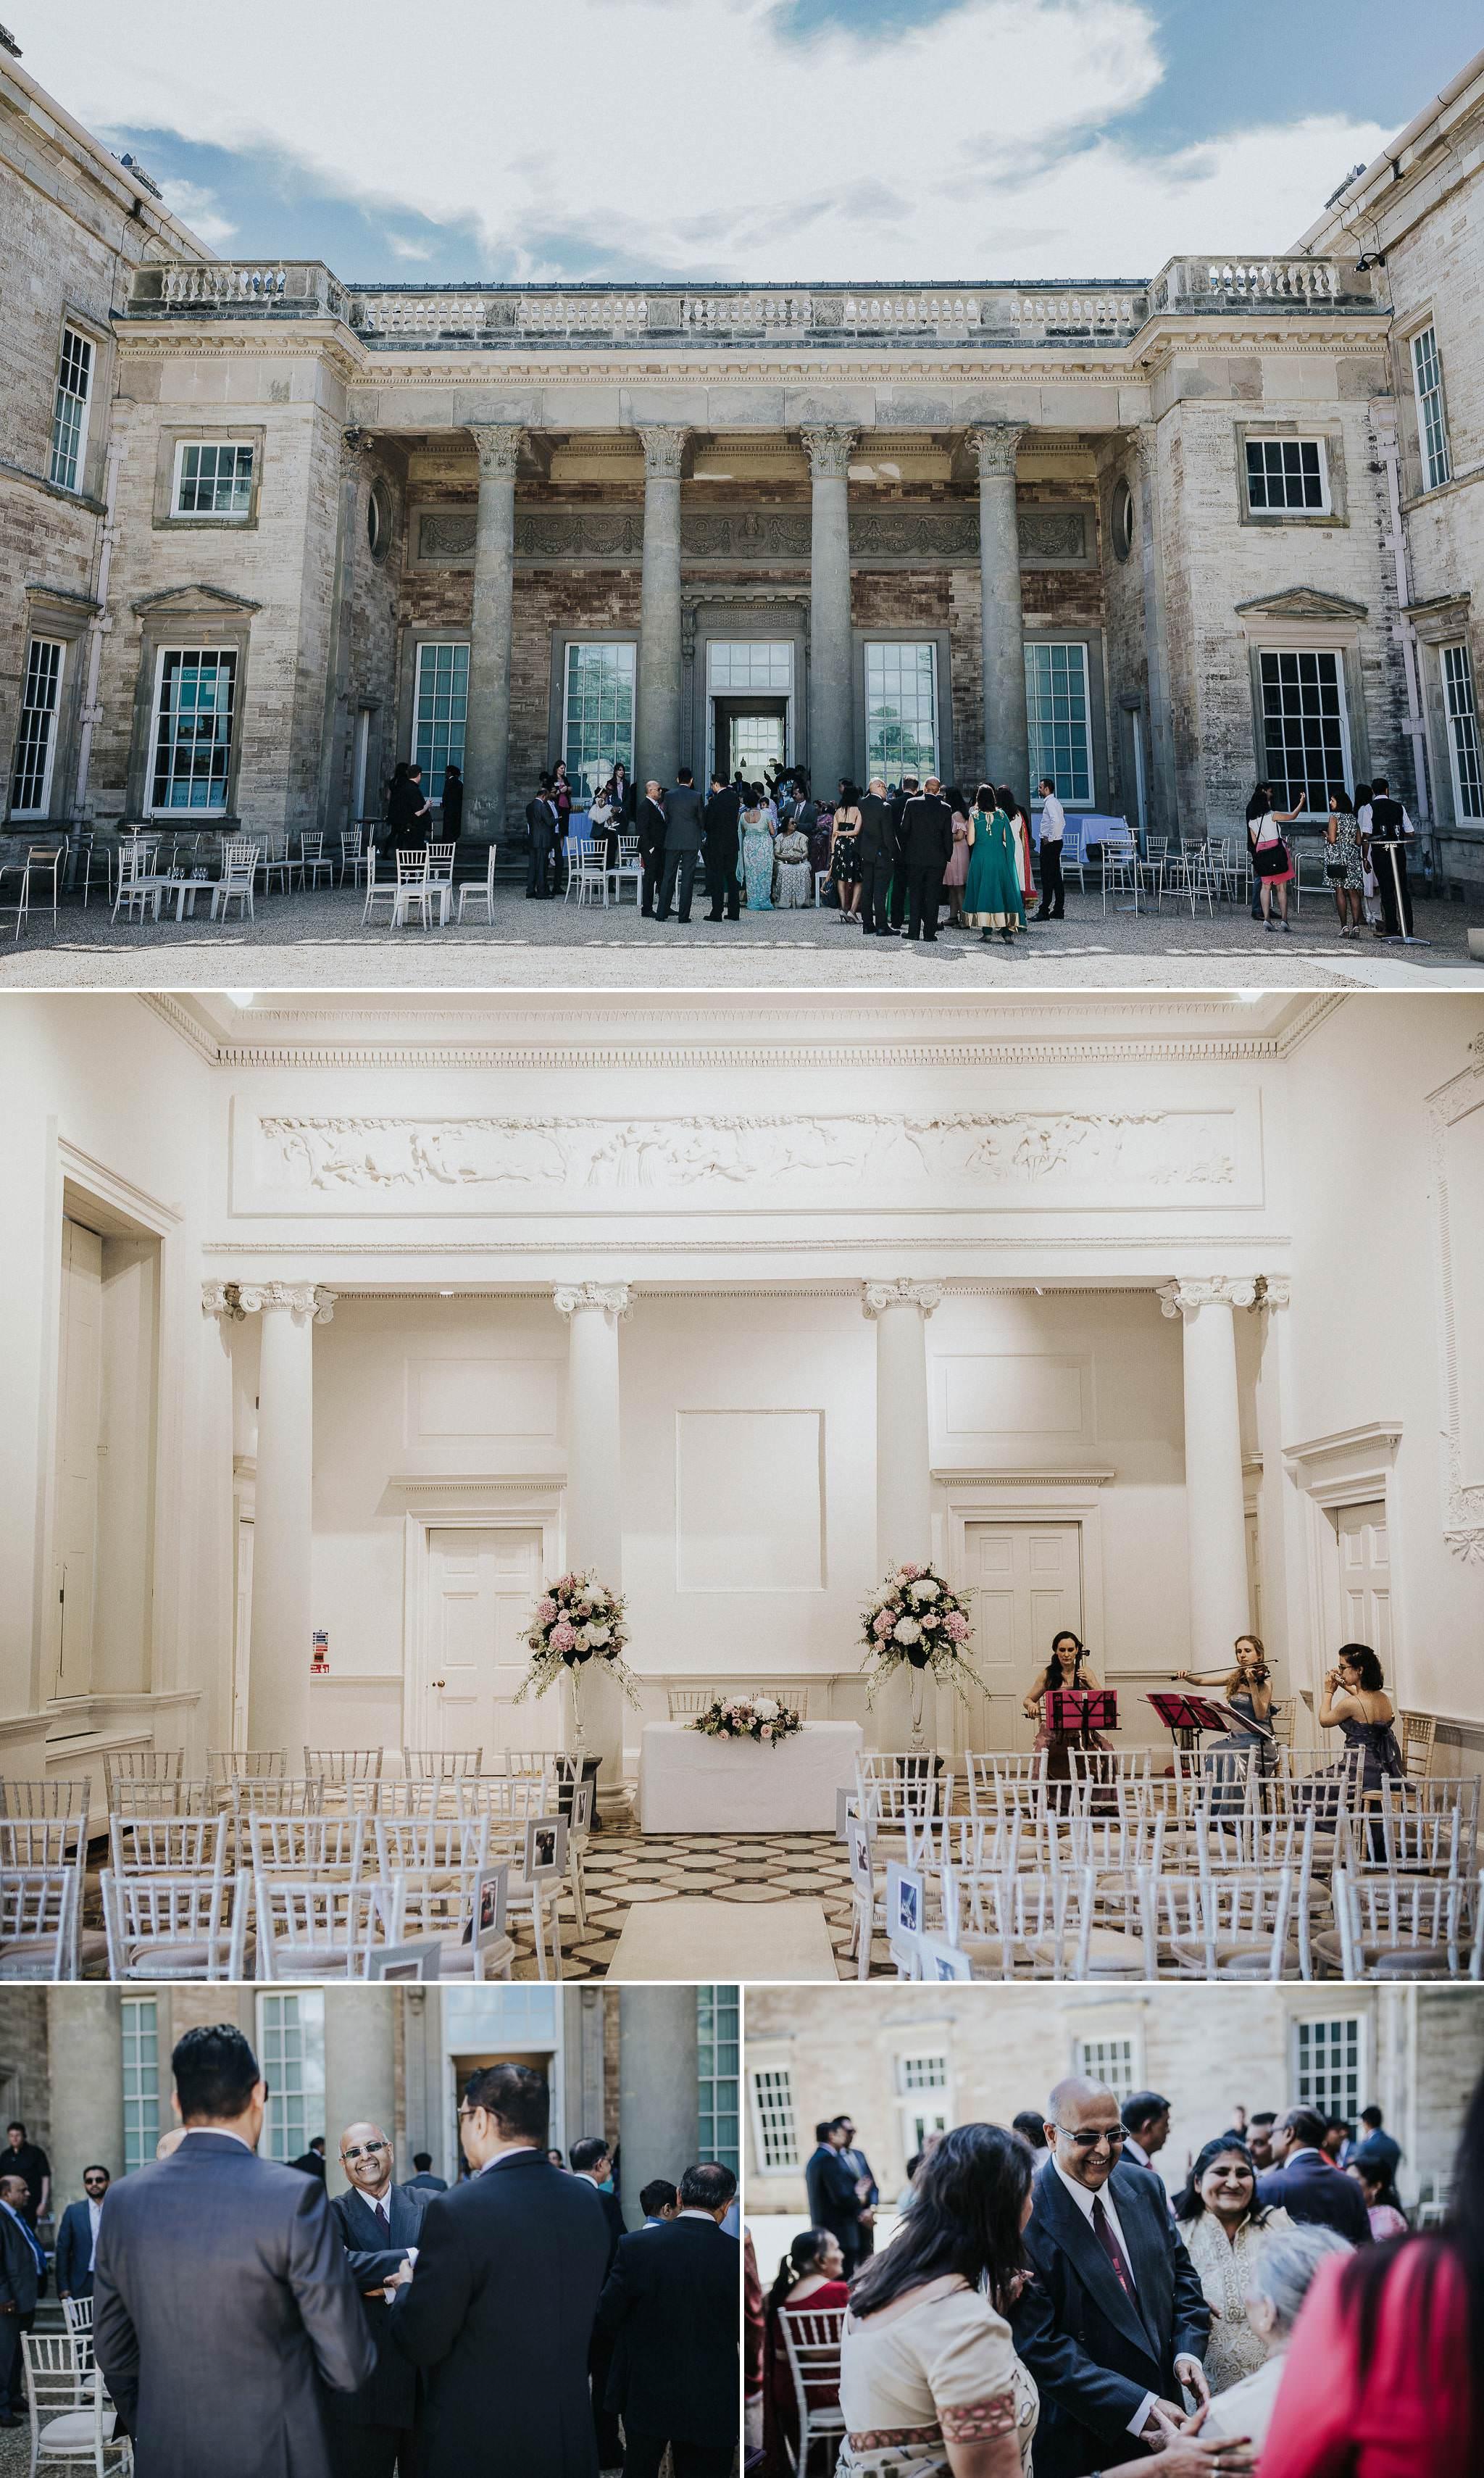 compton-verney-wedding-photos 9.jpg